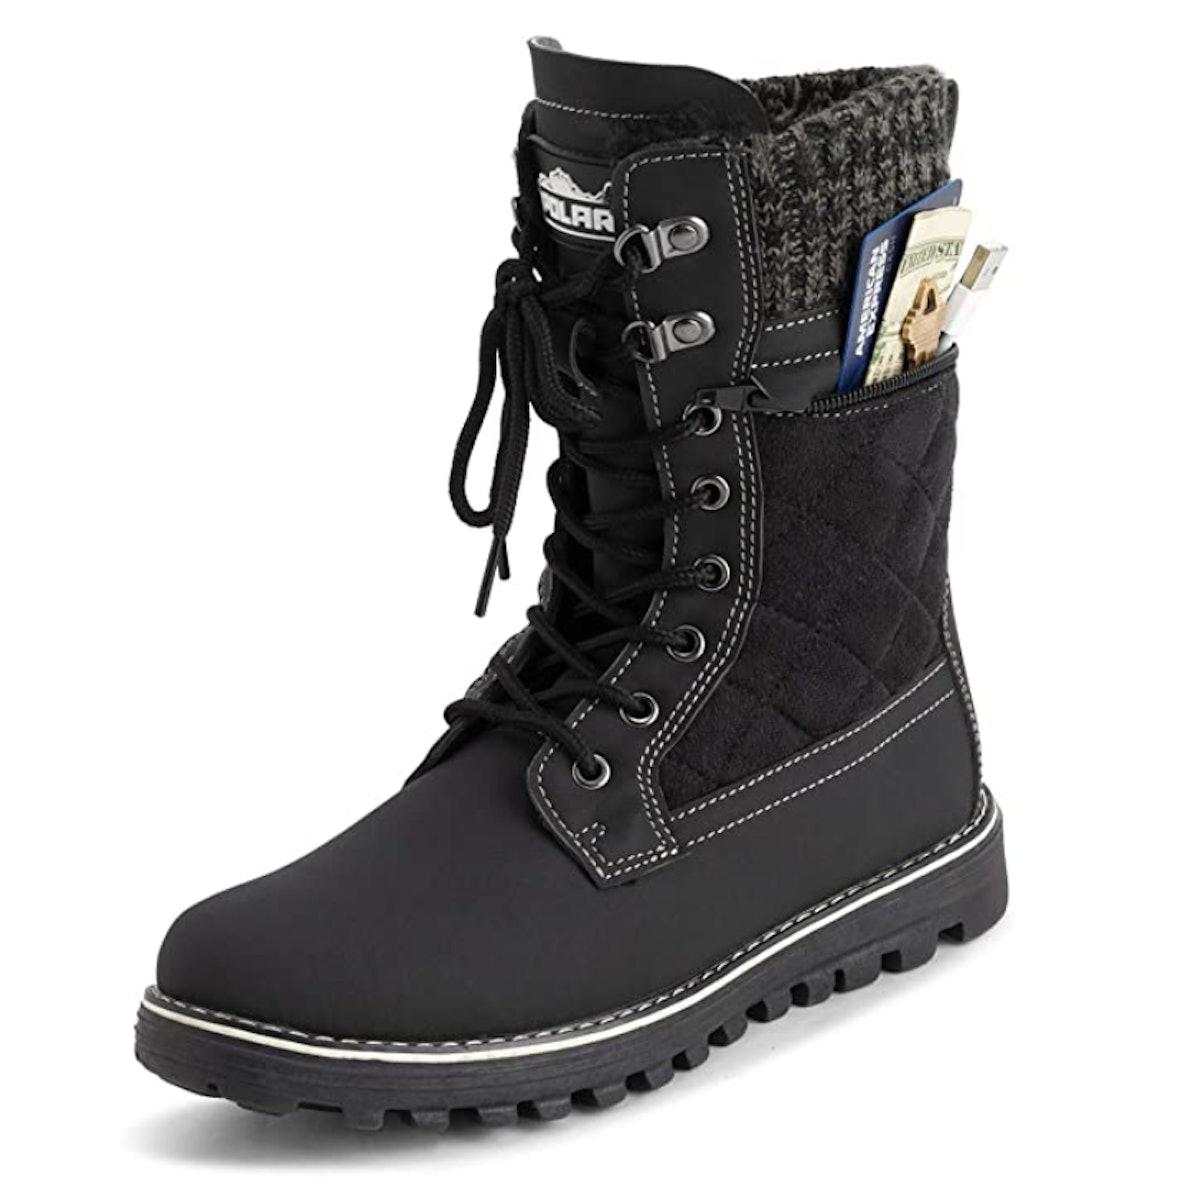 Polar Thermal Waterproof Snow Boots